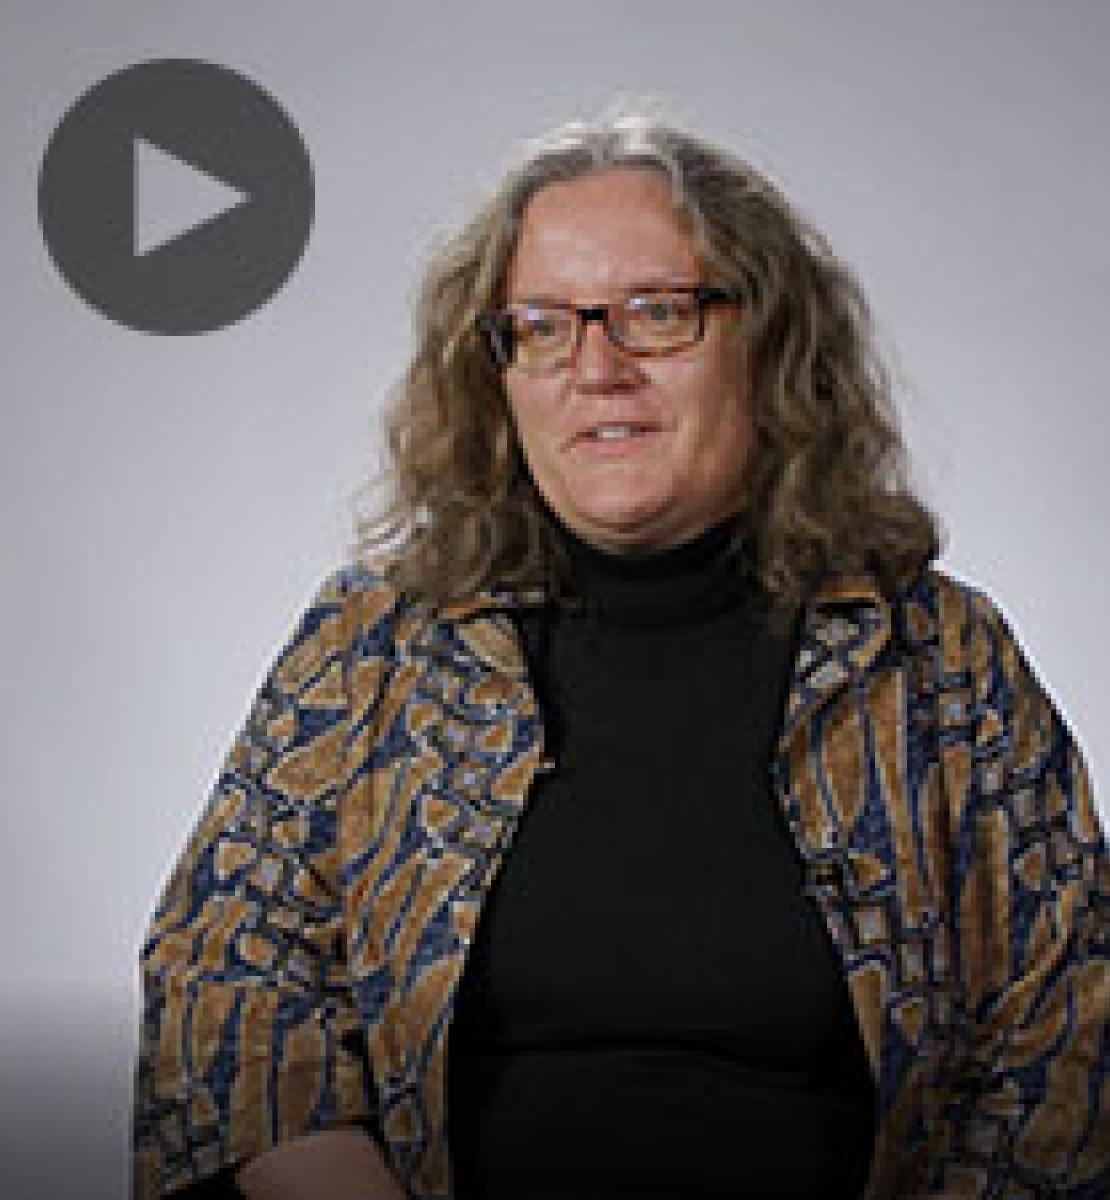 Screenshot from video message shows Resident Coordinator, Sabine Machl